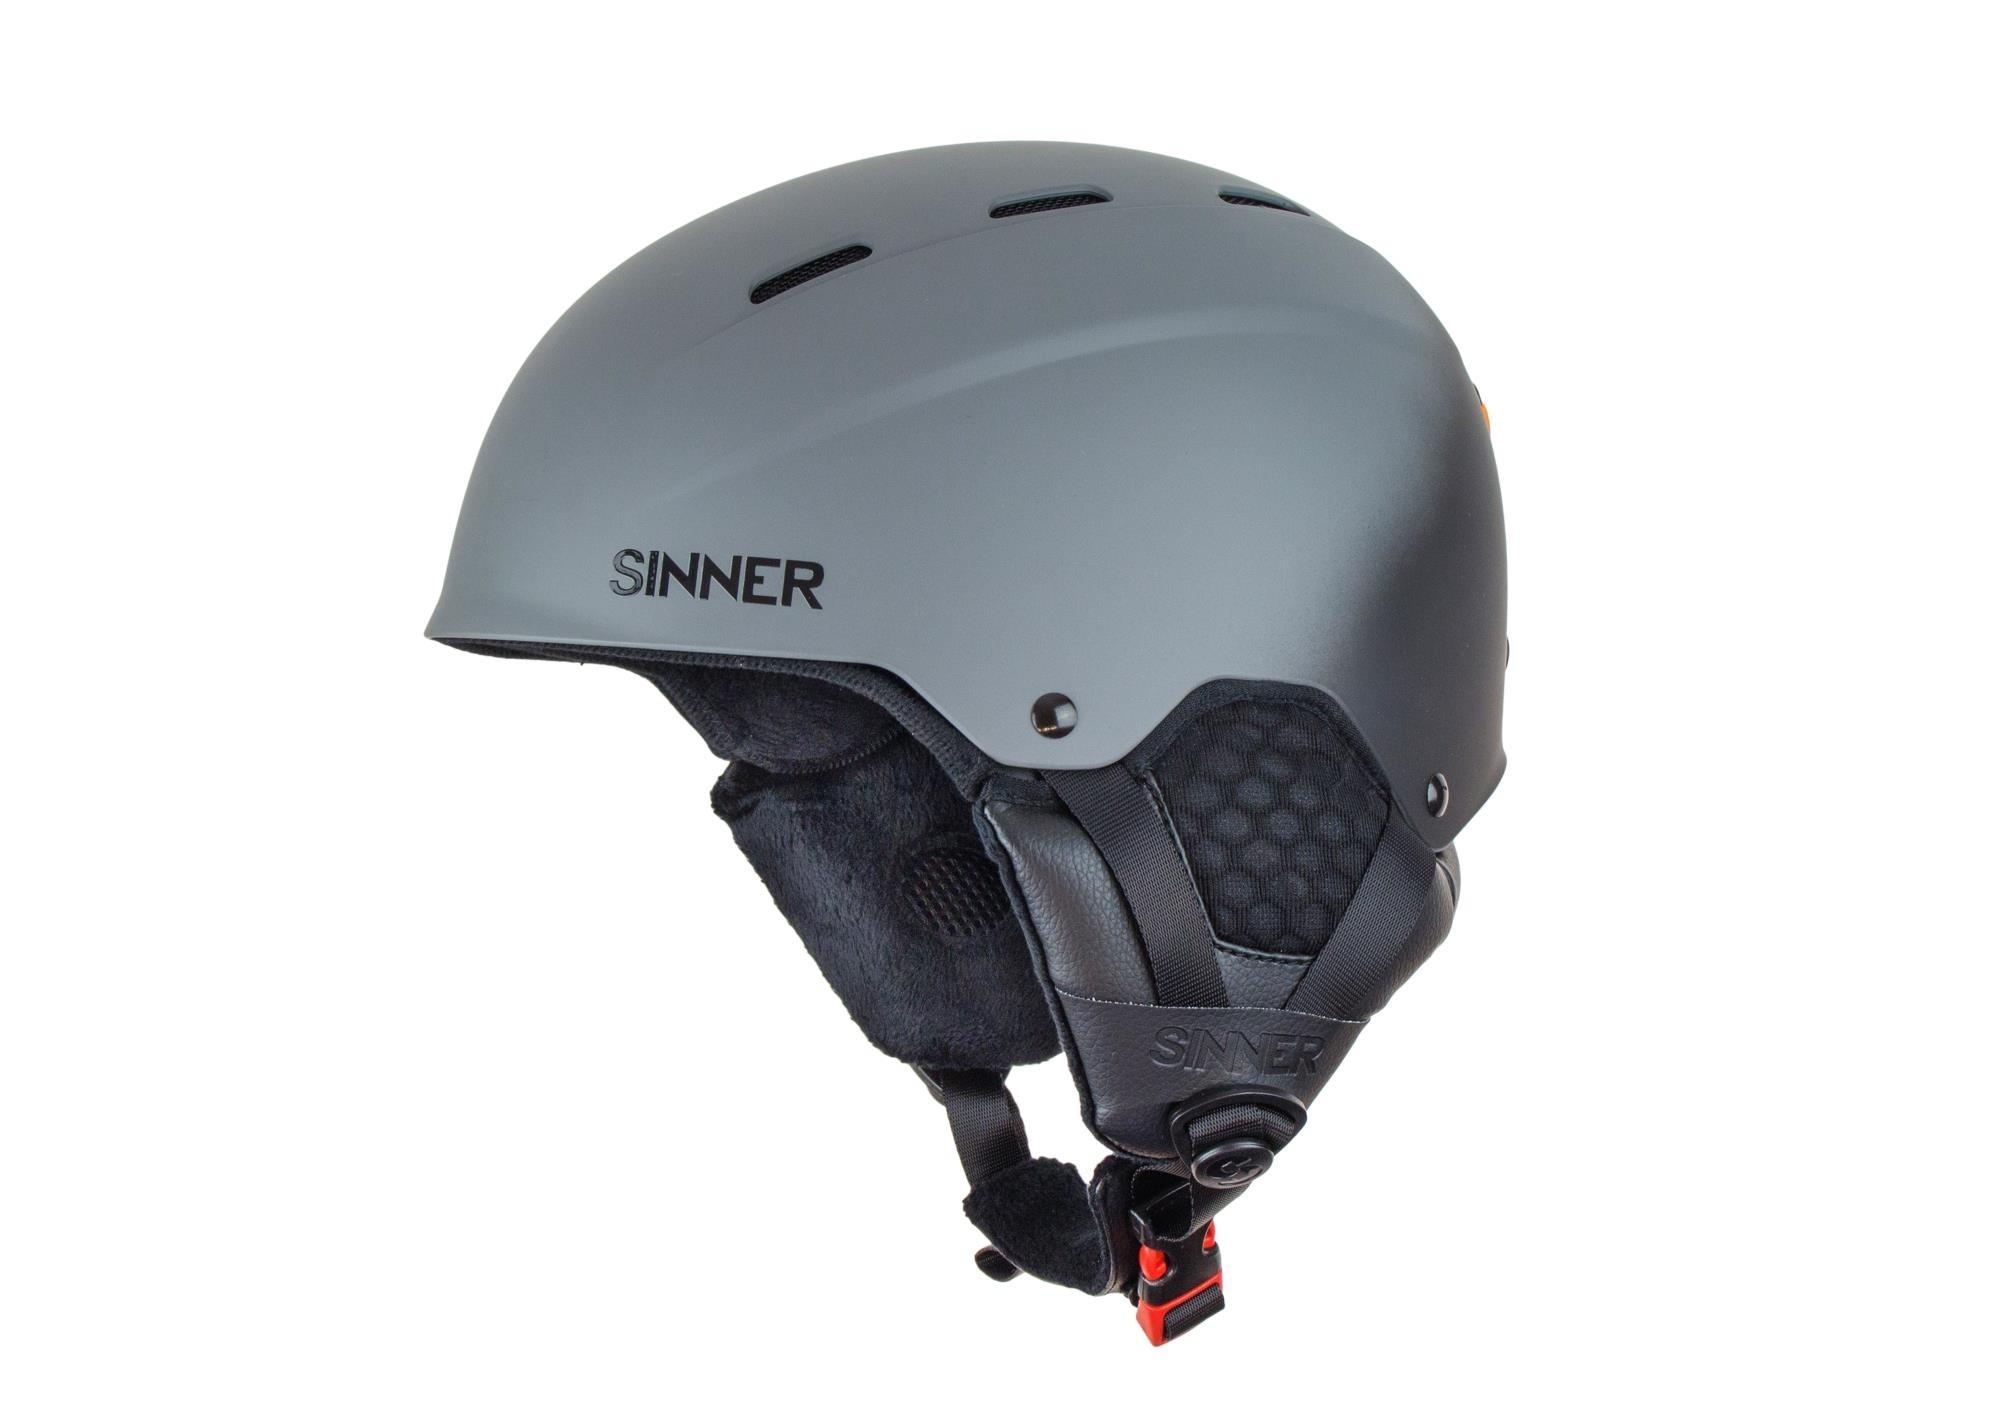 Sinner ski-snowboardhelm Typhoon